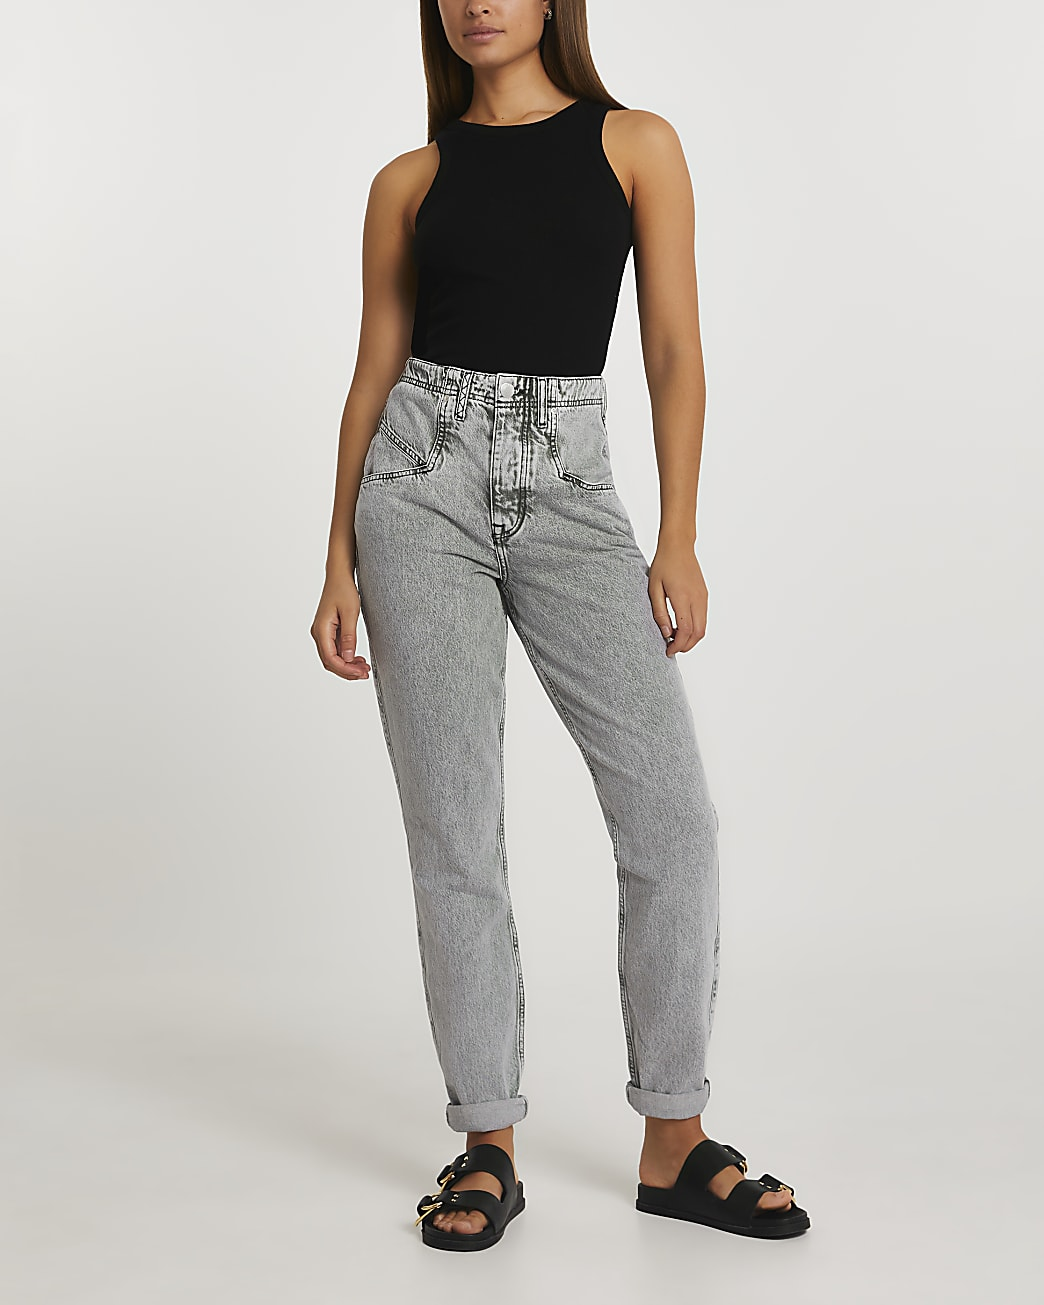 Grey mom high waisted grey jeans